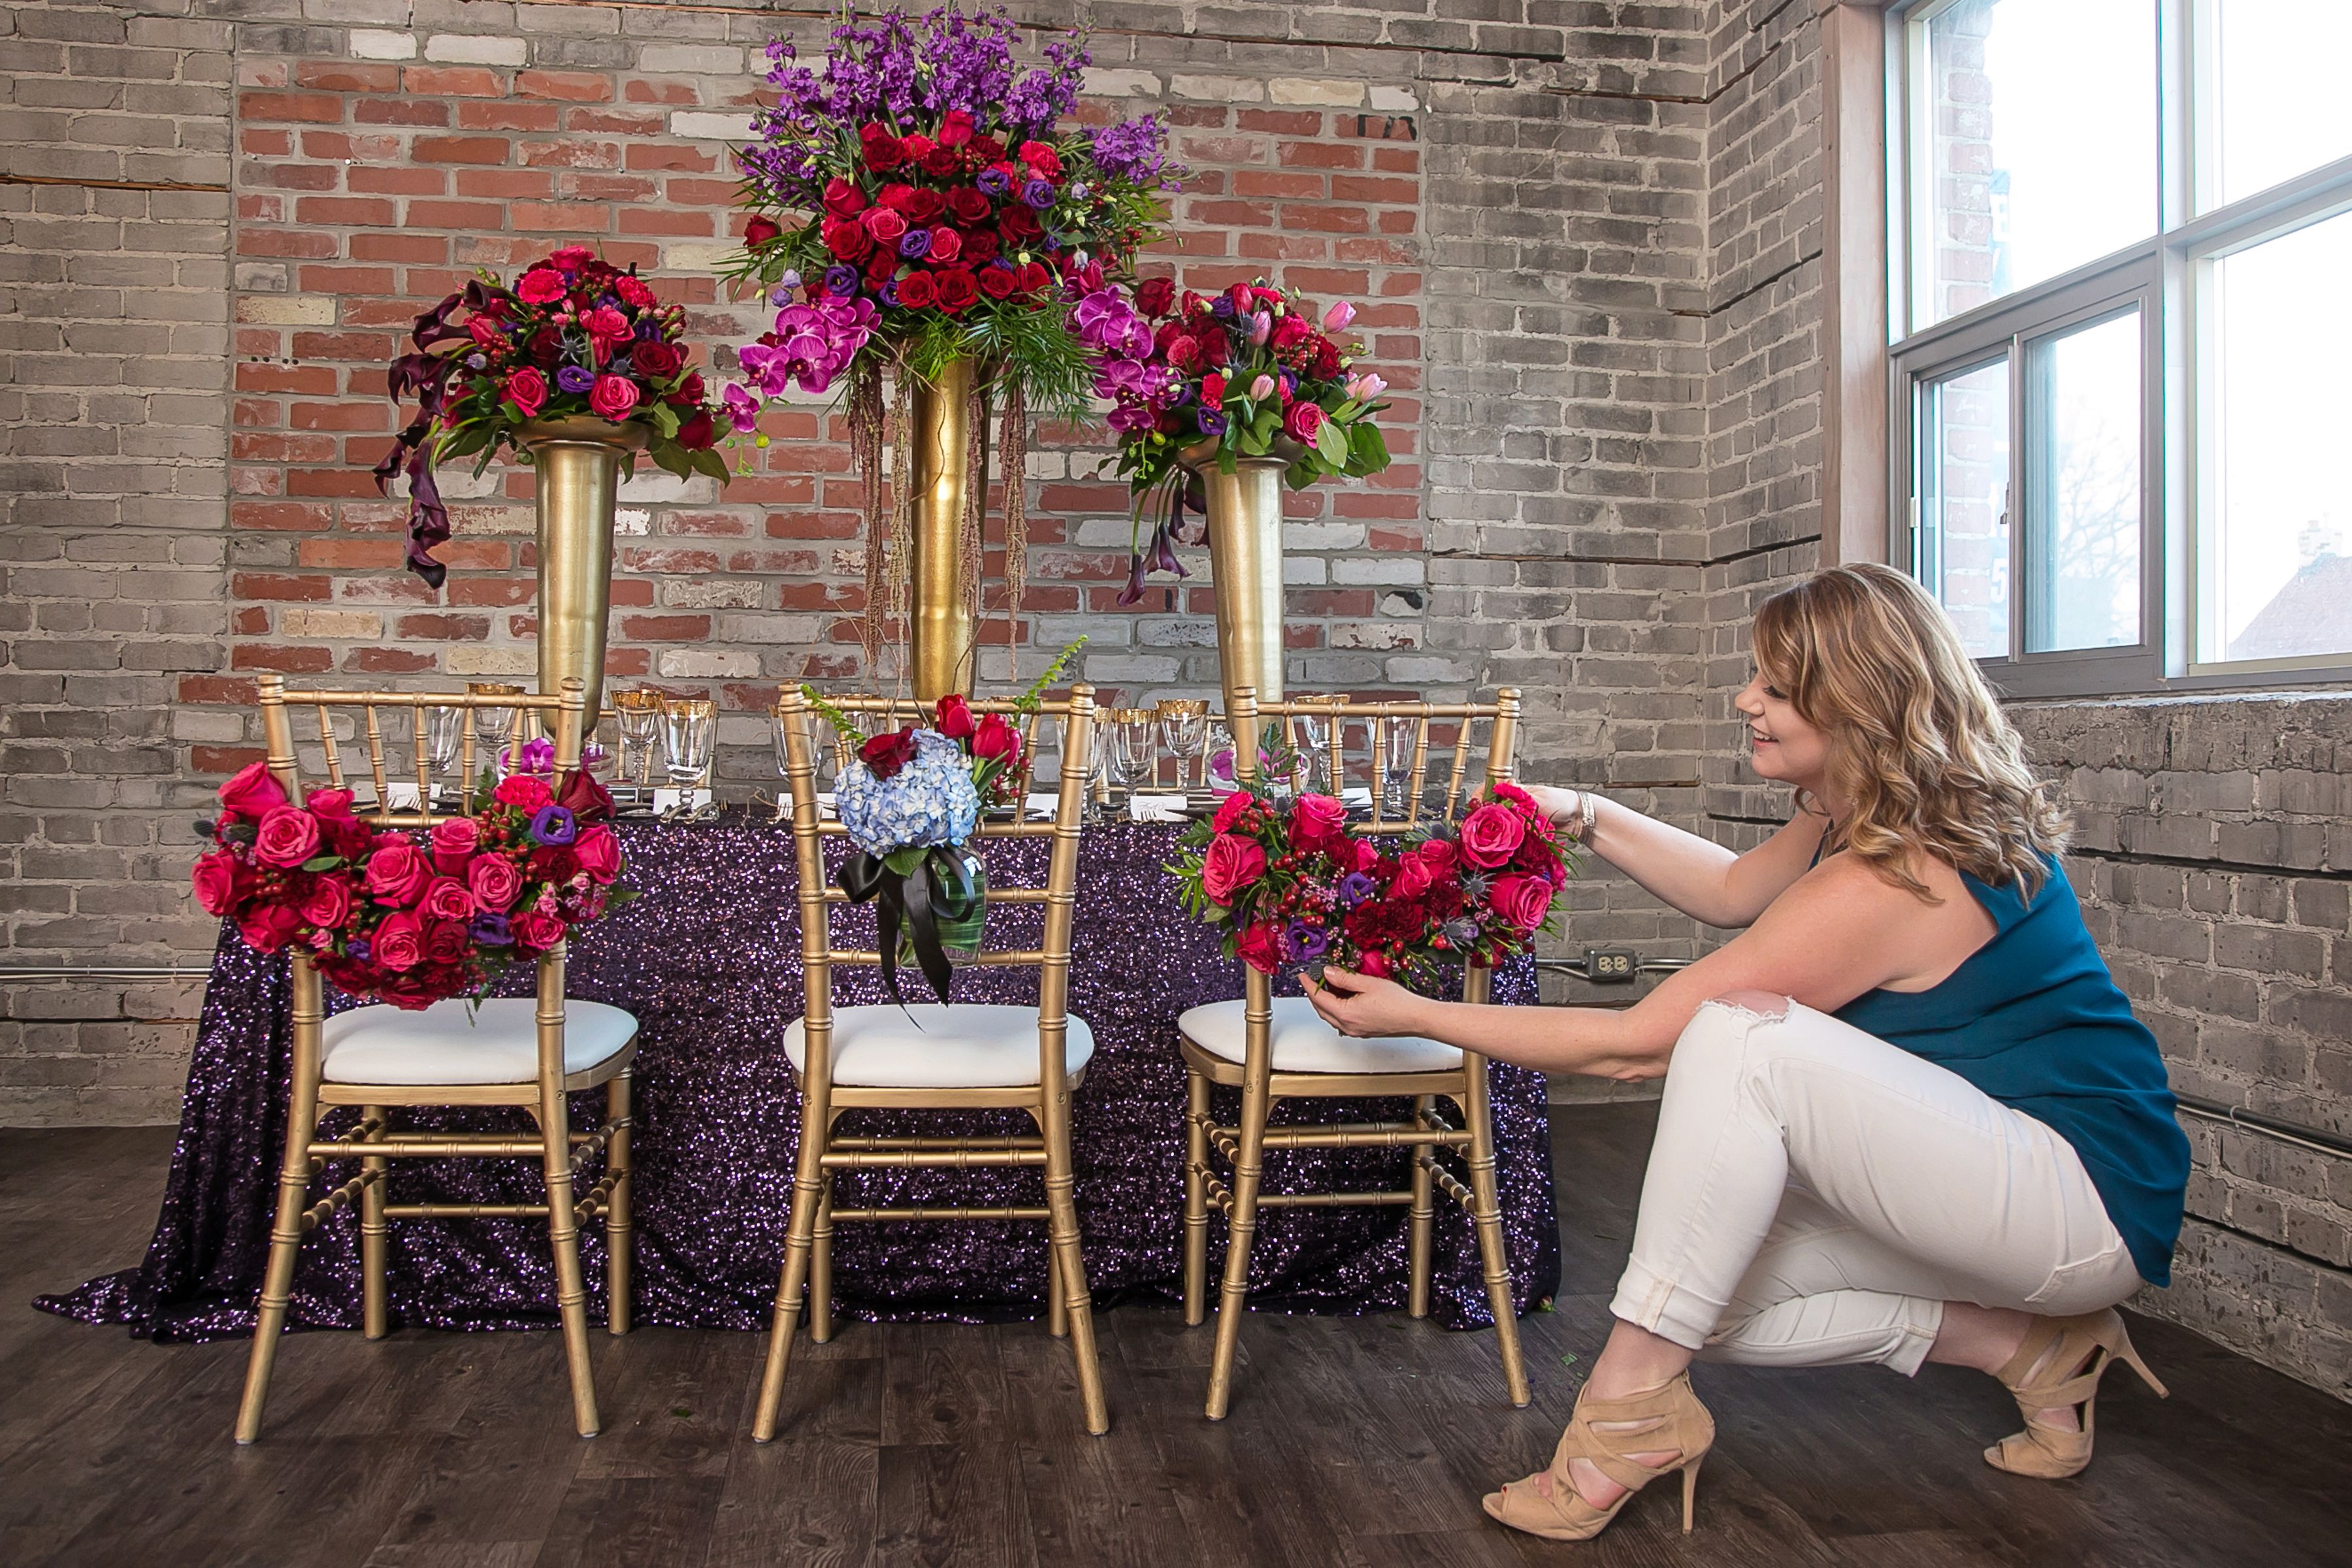 Wedding Decorations Average Cost Checklist Wedding Flower Budget First Comes Love Wedding Flowers Cost Wedding Flowers Summer Cheap Wedding Flowers